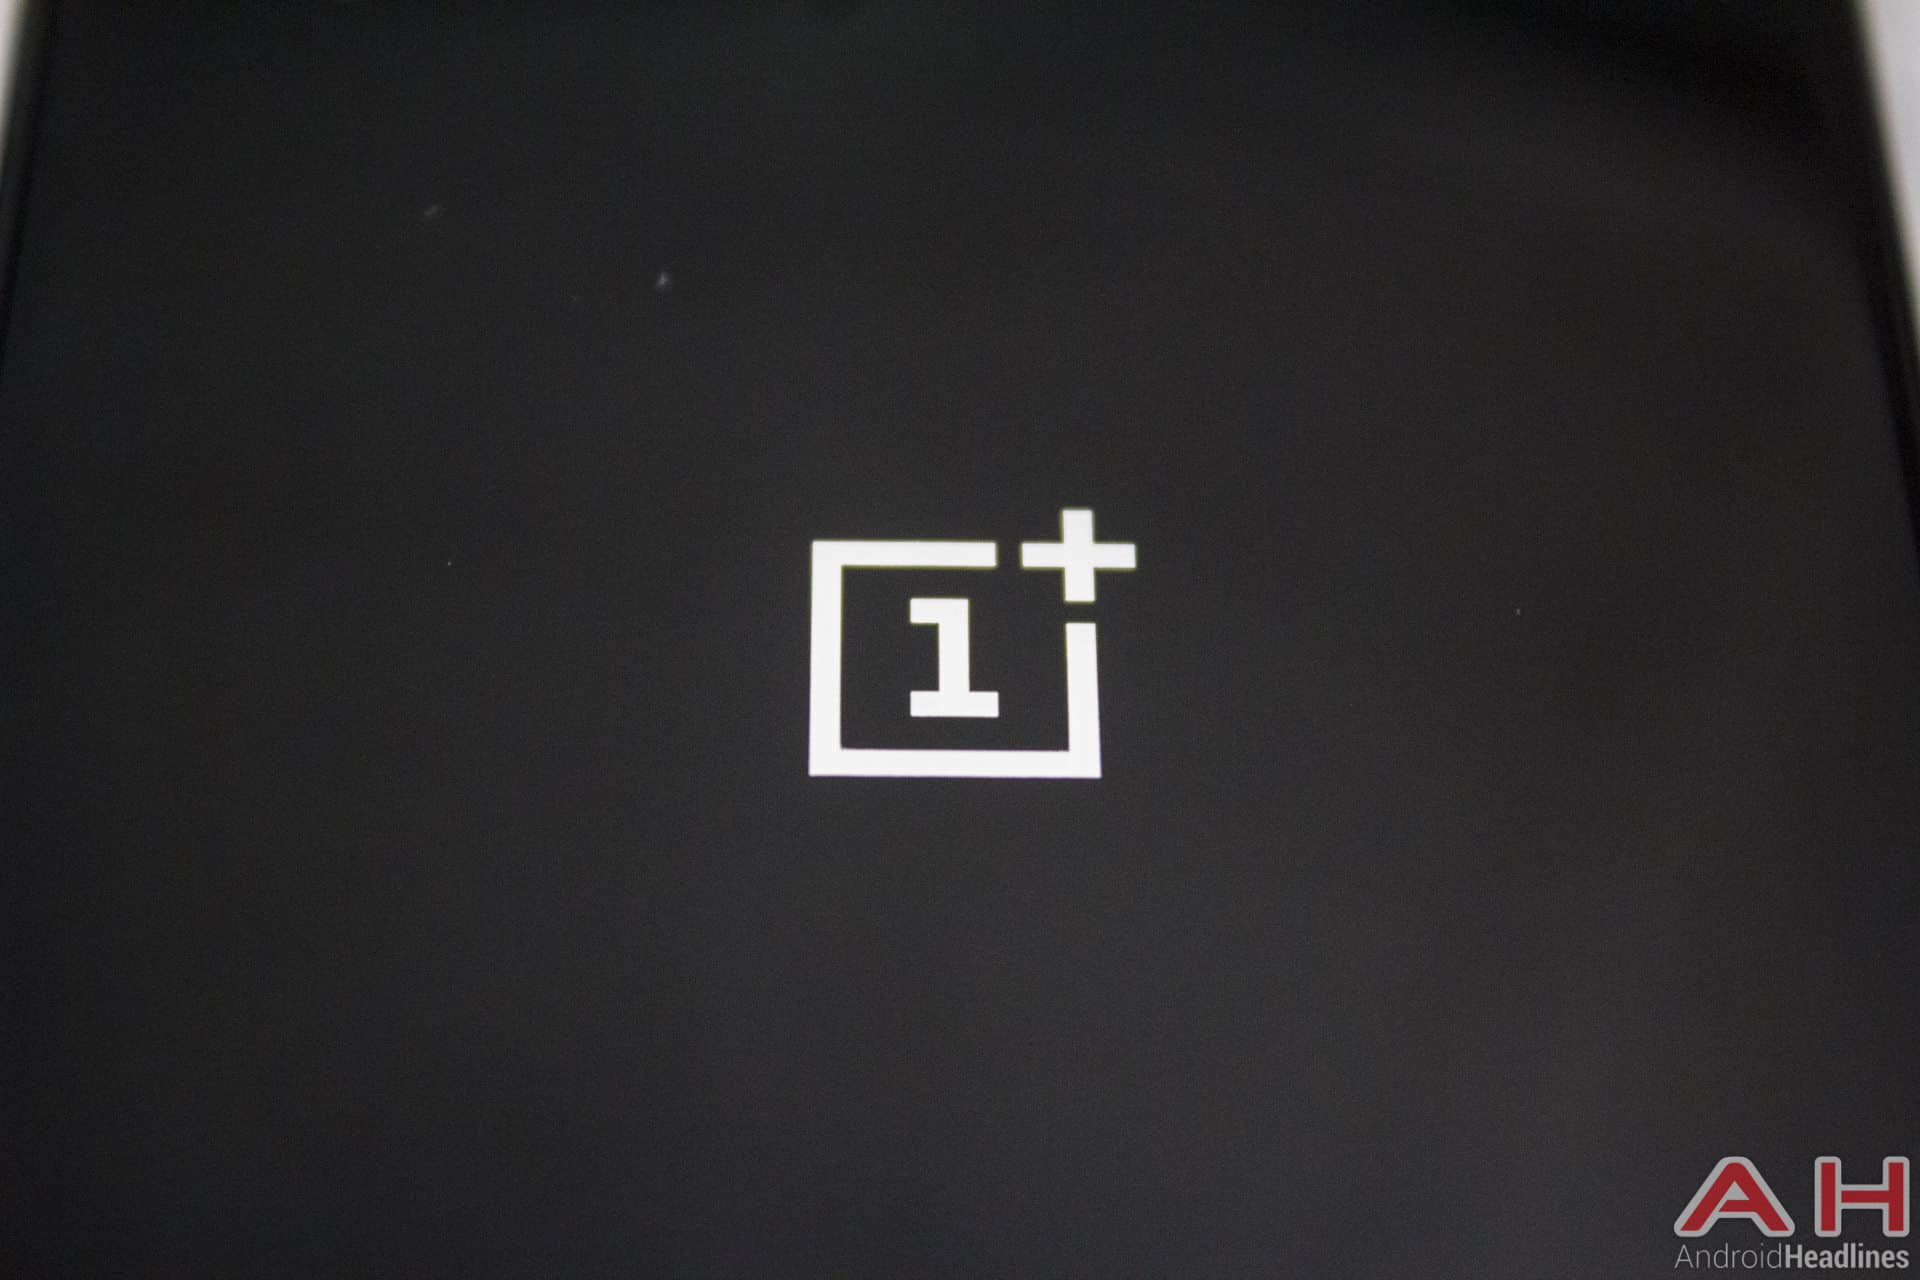 OnePlus-X-AH-logo-5